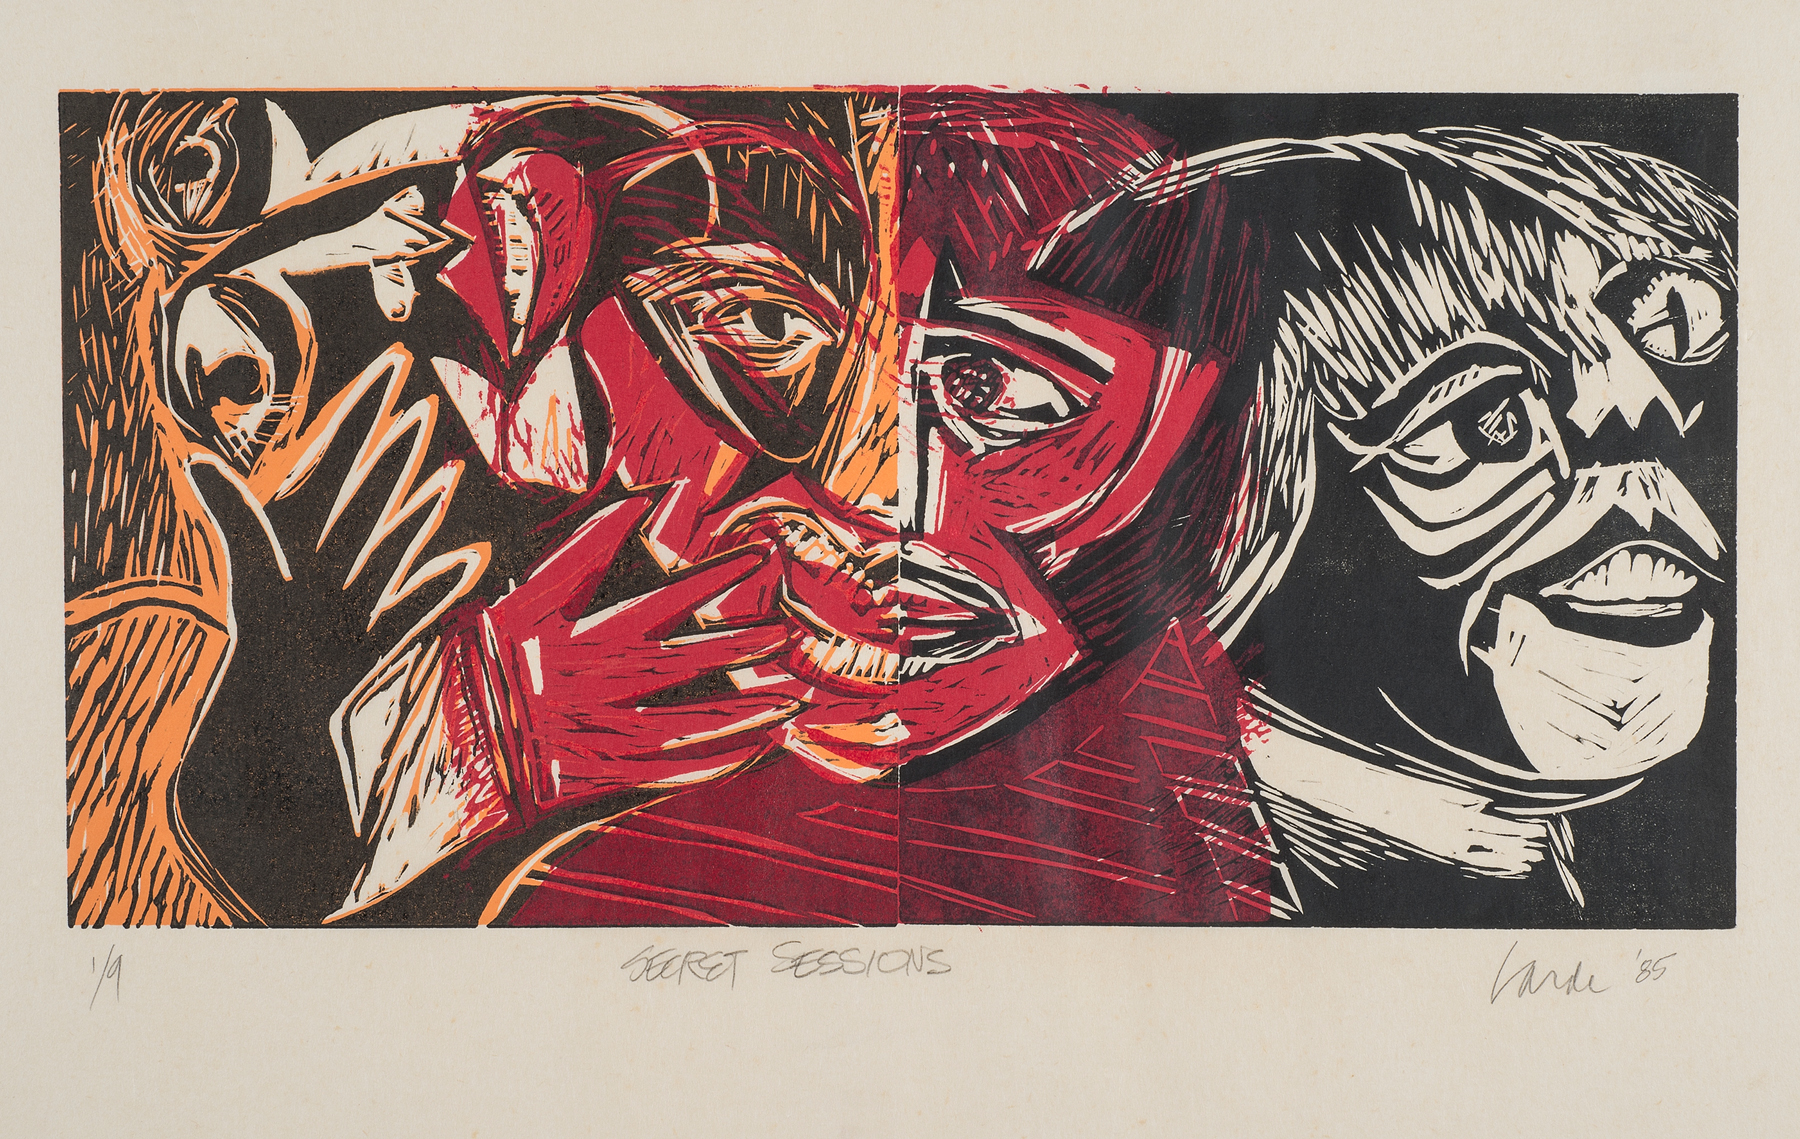 Secret Sessions , 1985. Linocut on paper, 19 x 26.5 in. (48.3 x 67.3cm.)